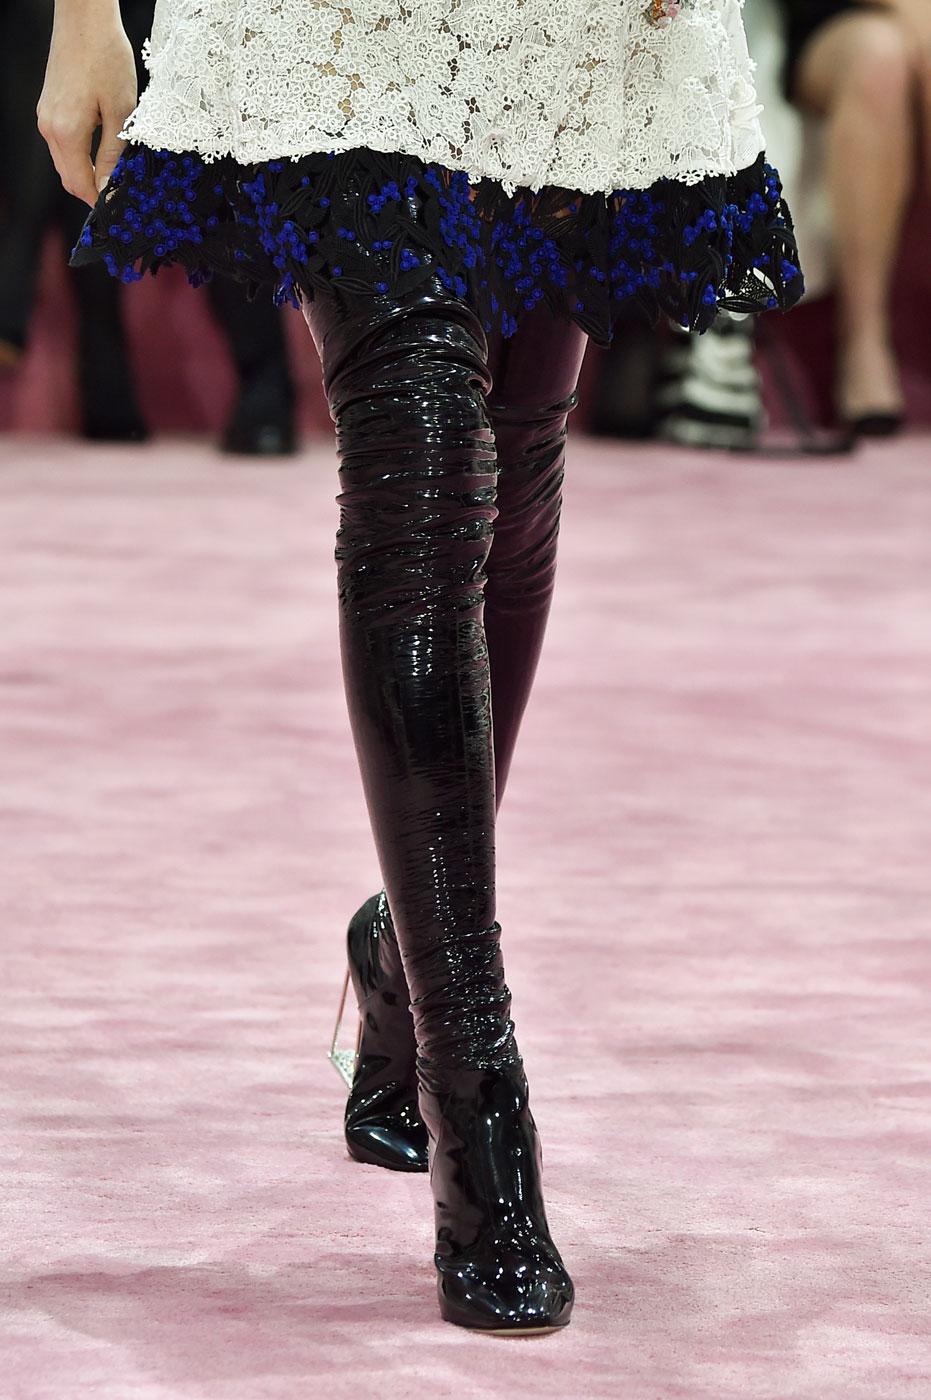 Christian-Dior-fashion-runway-show-close-ups-haute-couture-paris-spring-summer-2015-the-impression-094